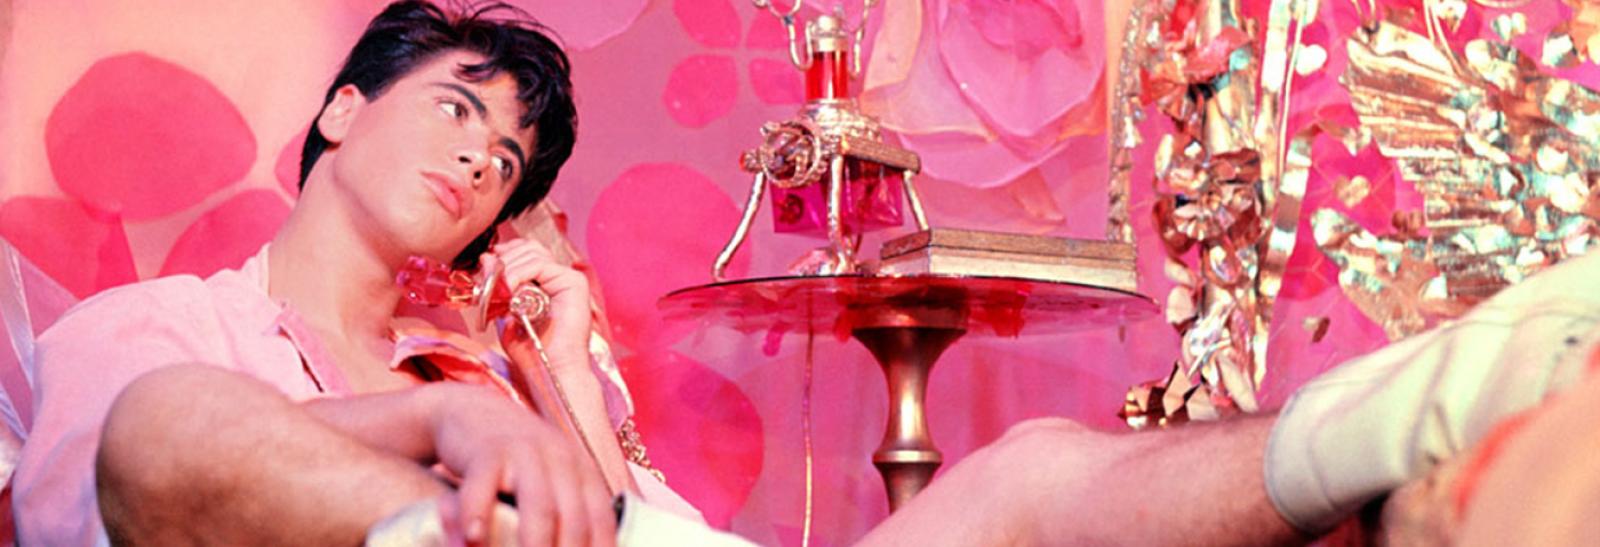 pink-narcissus.jpg